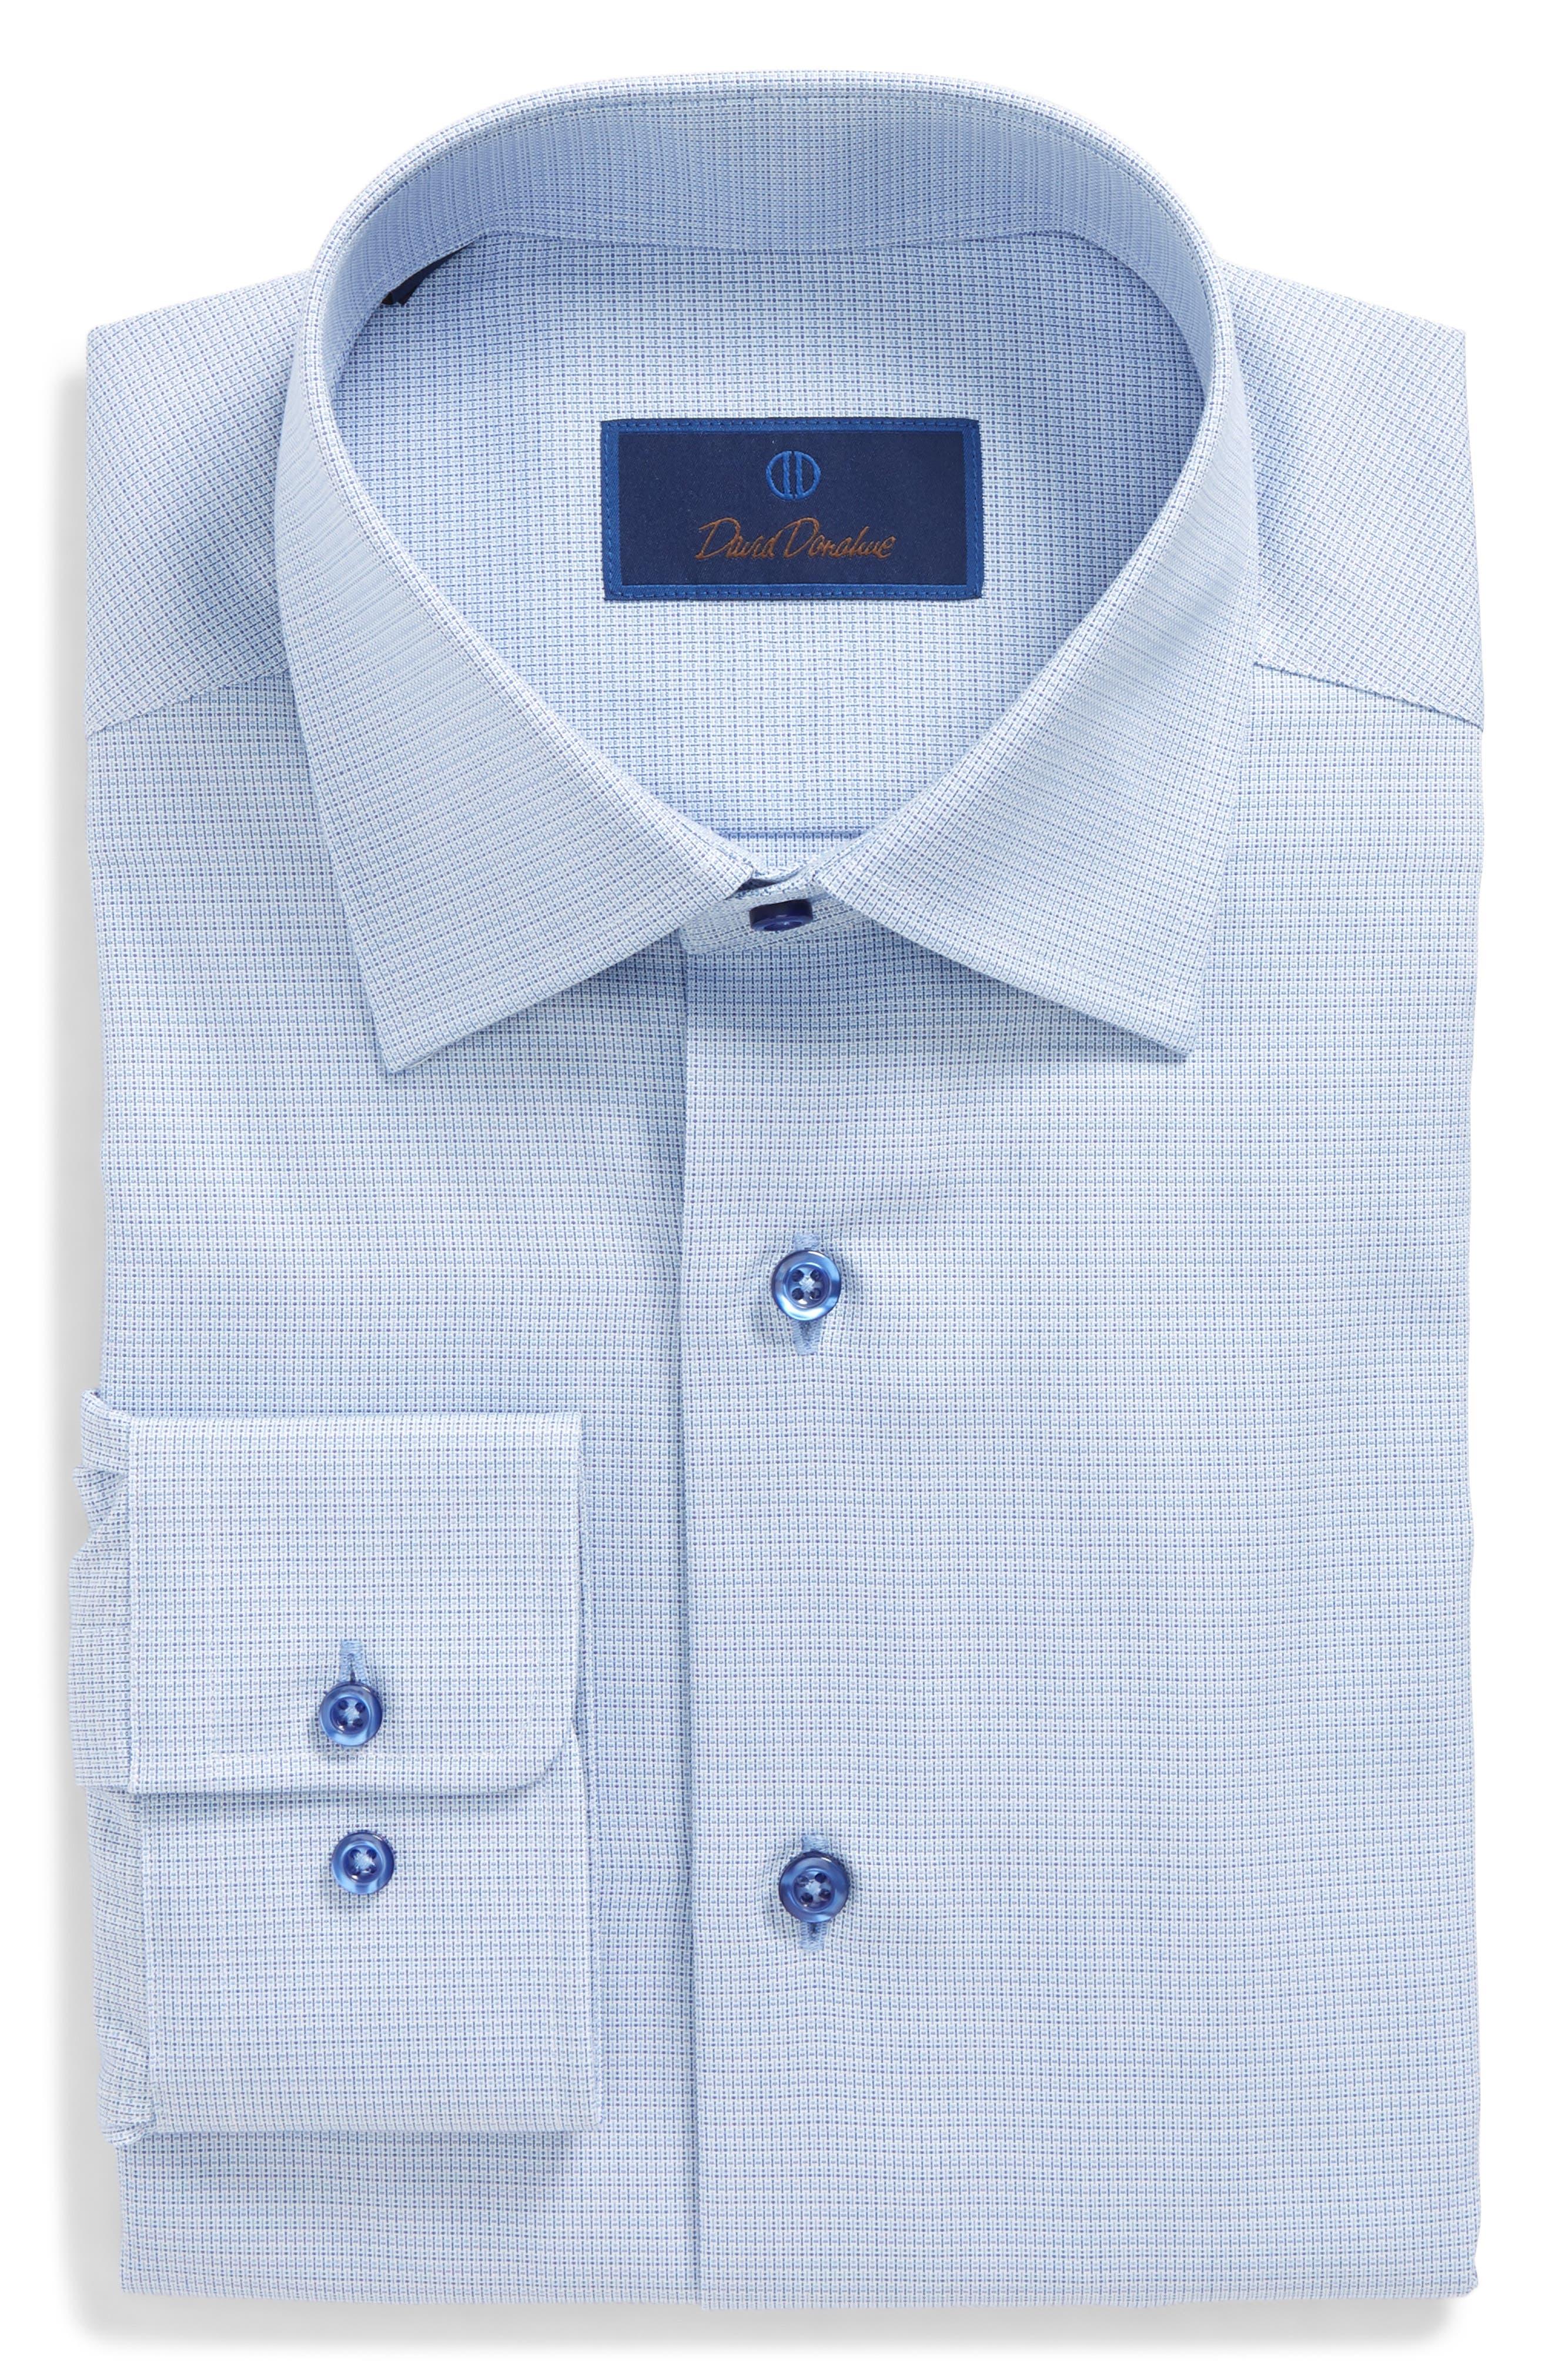 Regular Fit Solid Dress Shirt,                             Alternate thumbnail 6, color,                             Blue